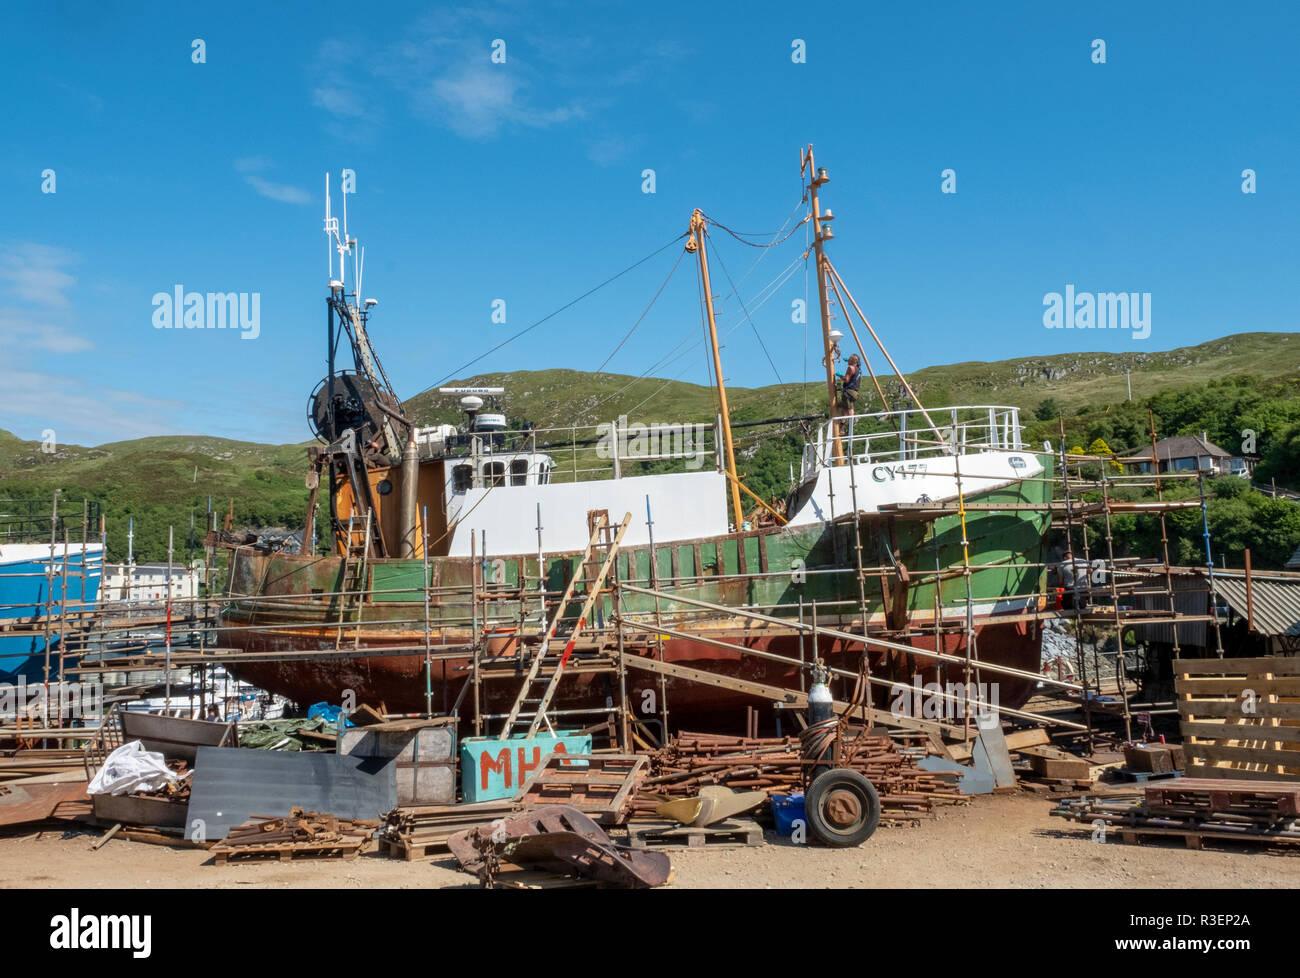 Fishing boat the Arnborg under repair in Mallaig boat yard, Mallaig, Scotland. Stock Photo